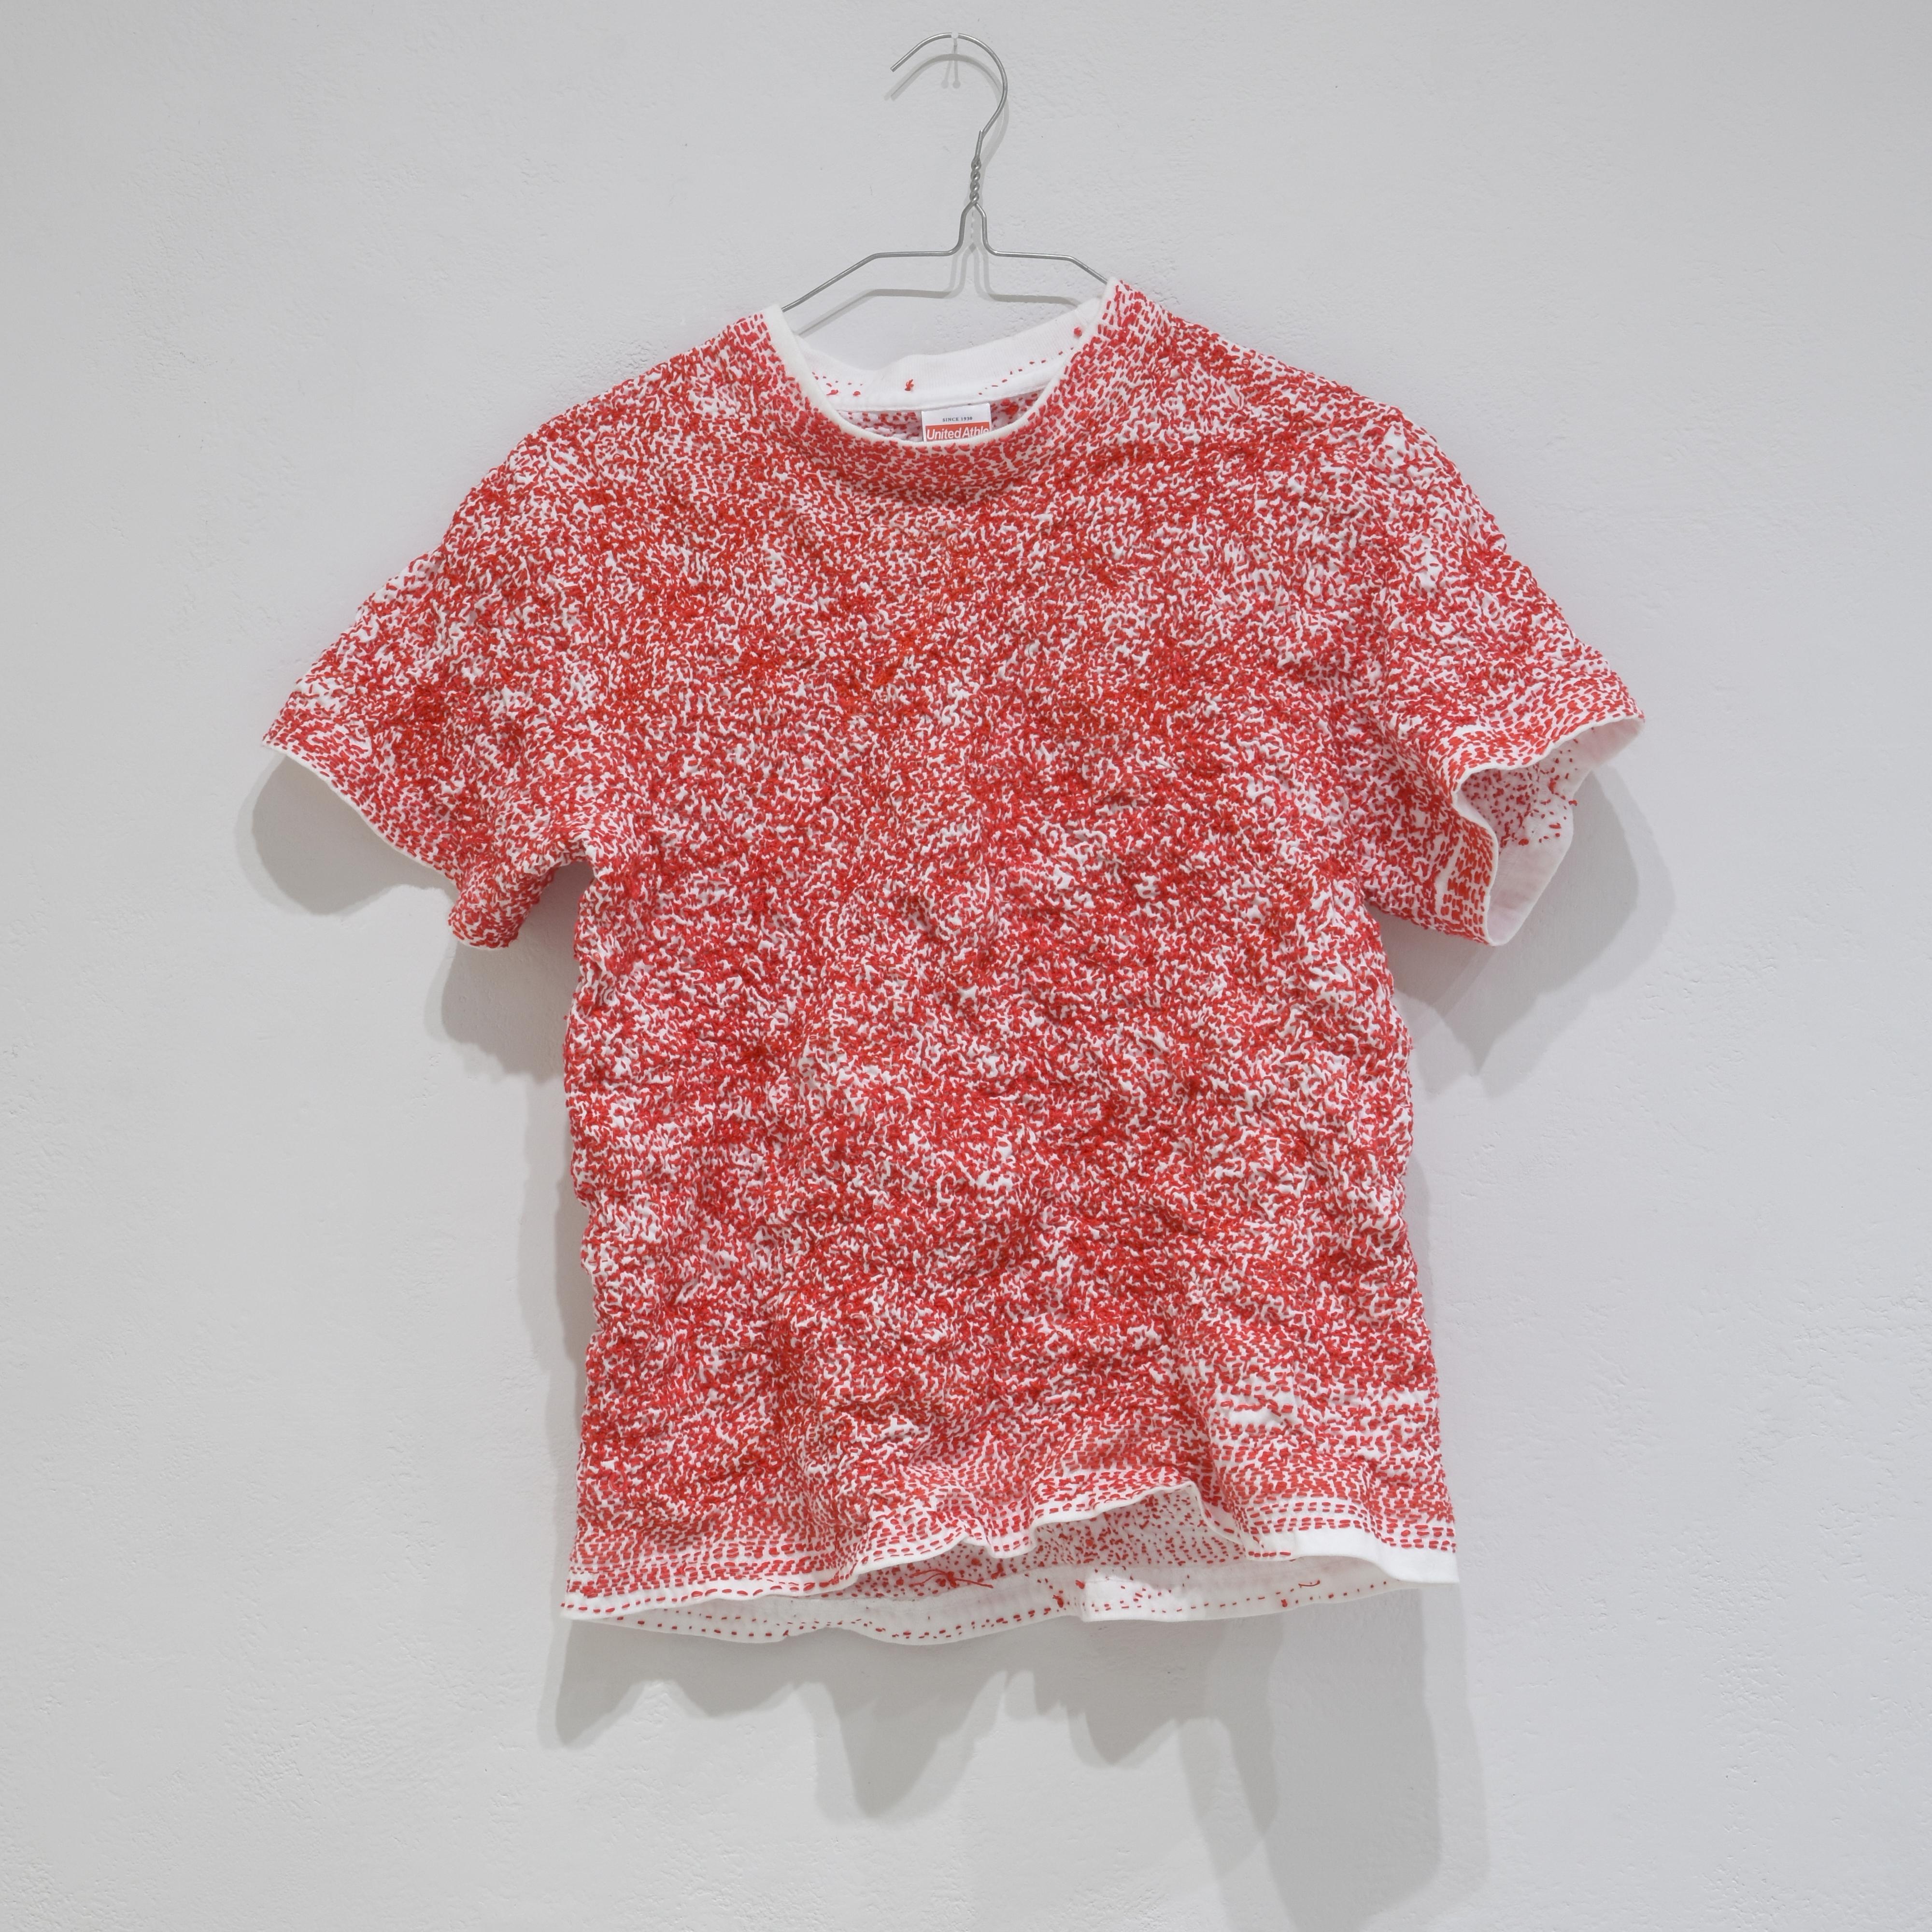 小松可奈子 / 作品「赤い糸」